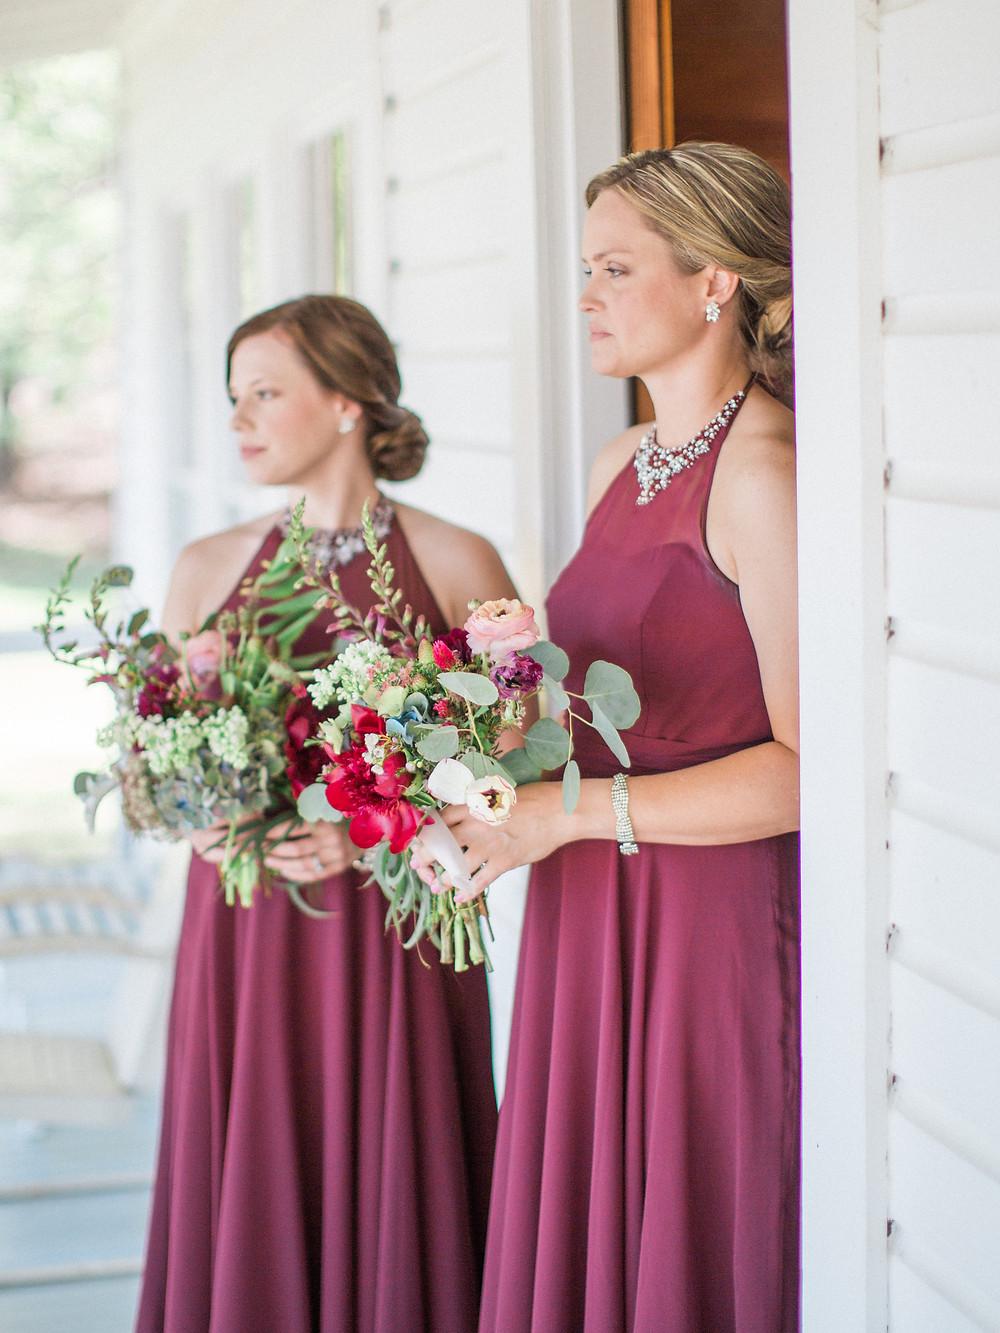 lake martin brides maids bouquets